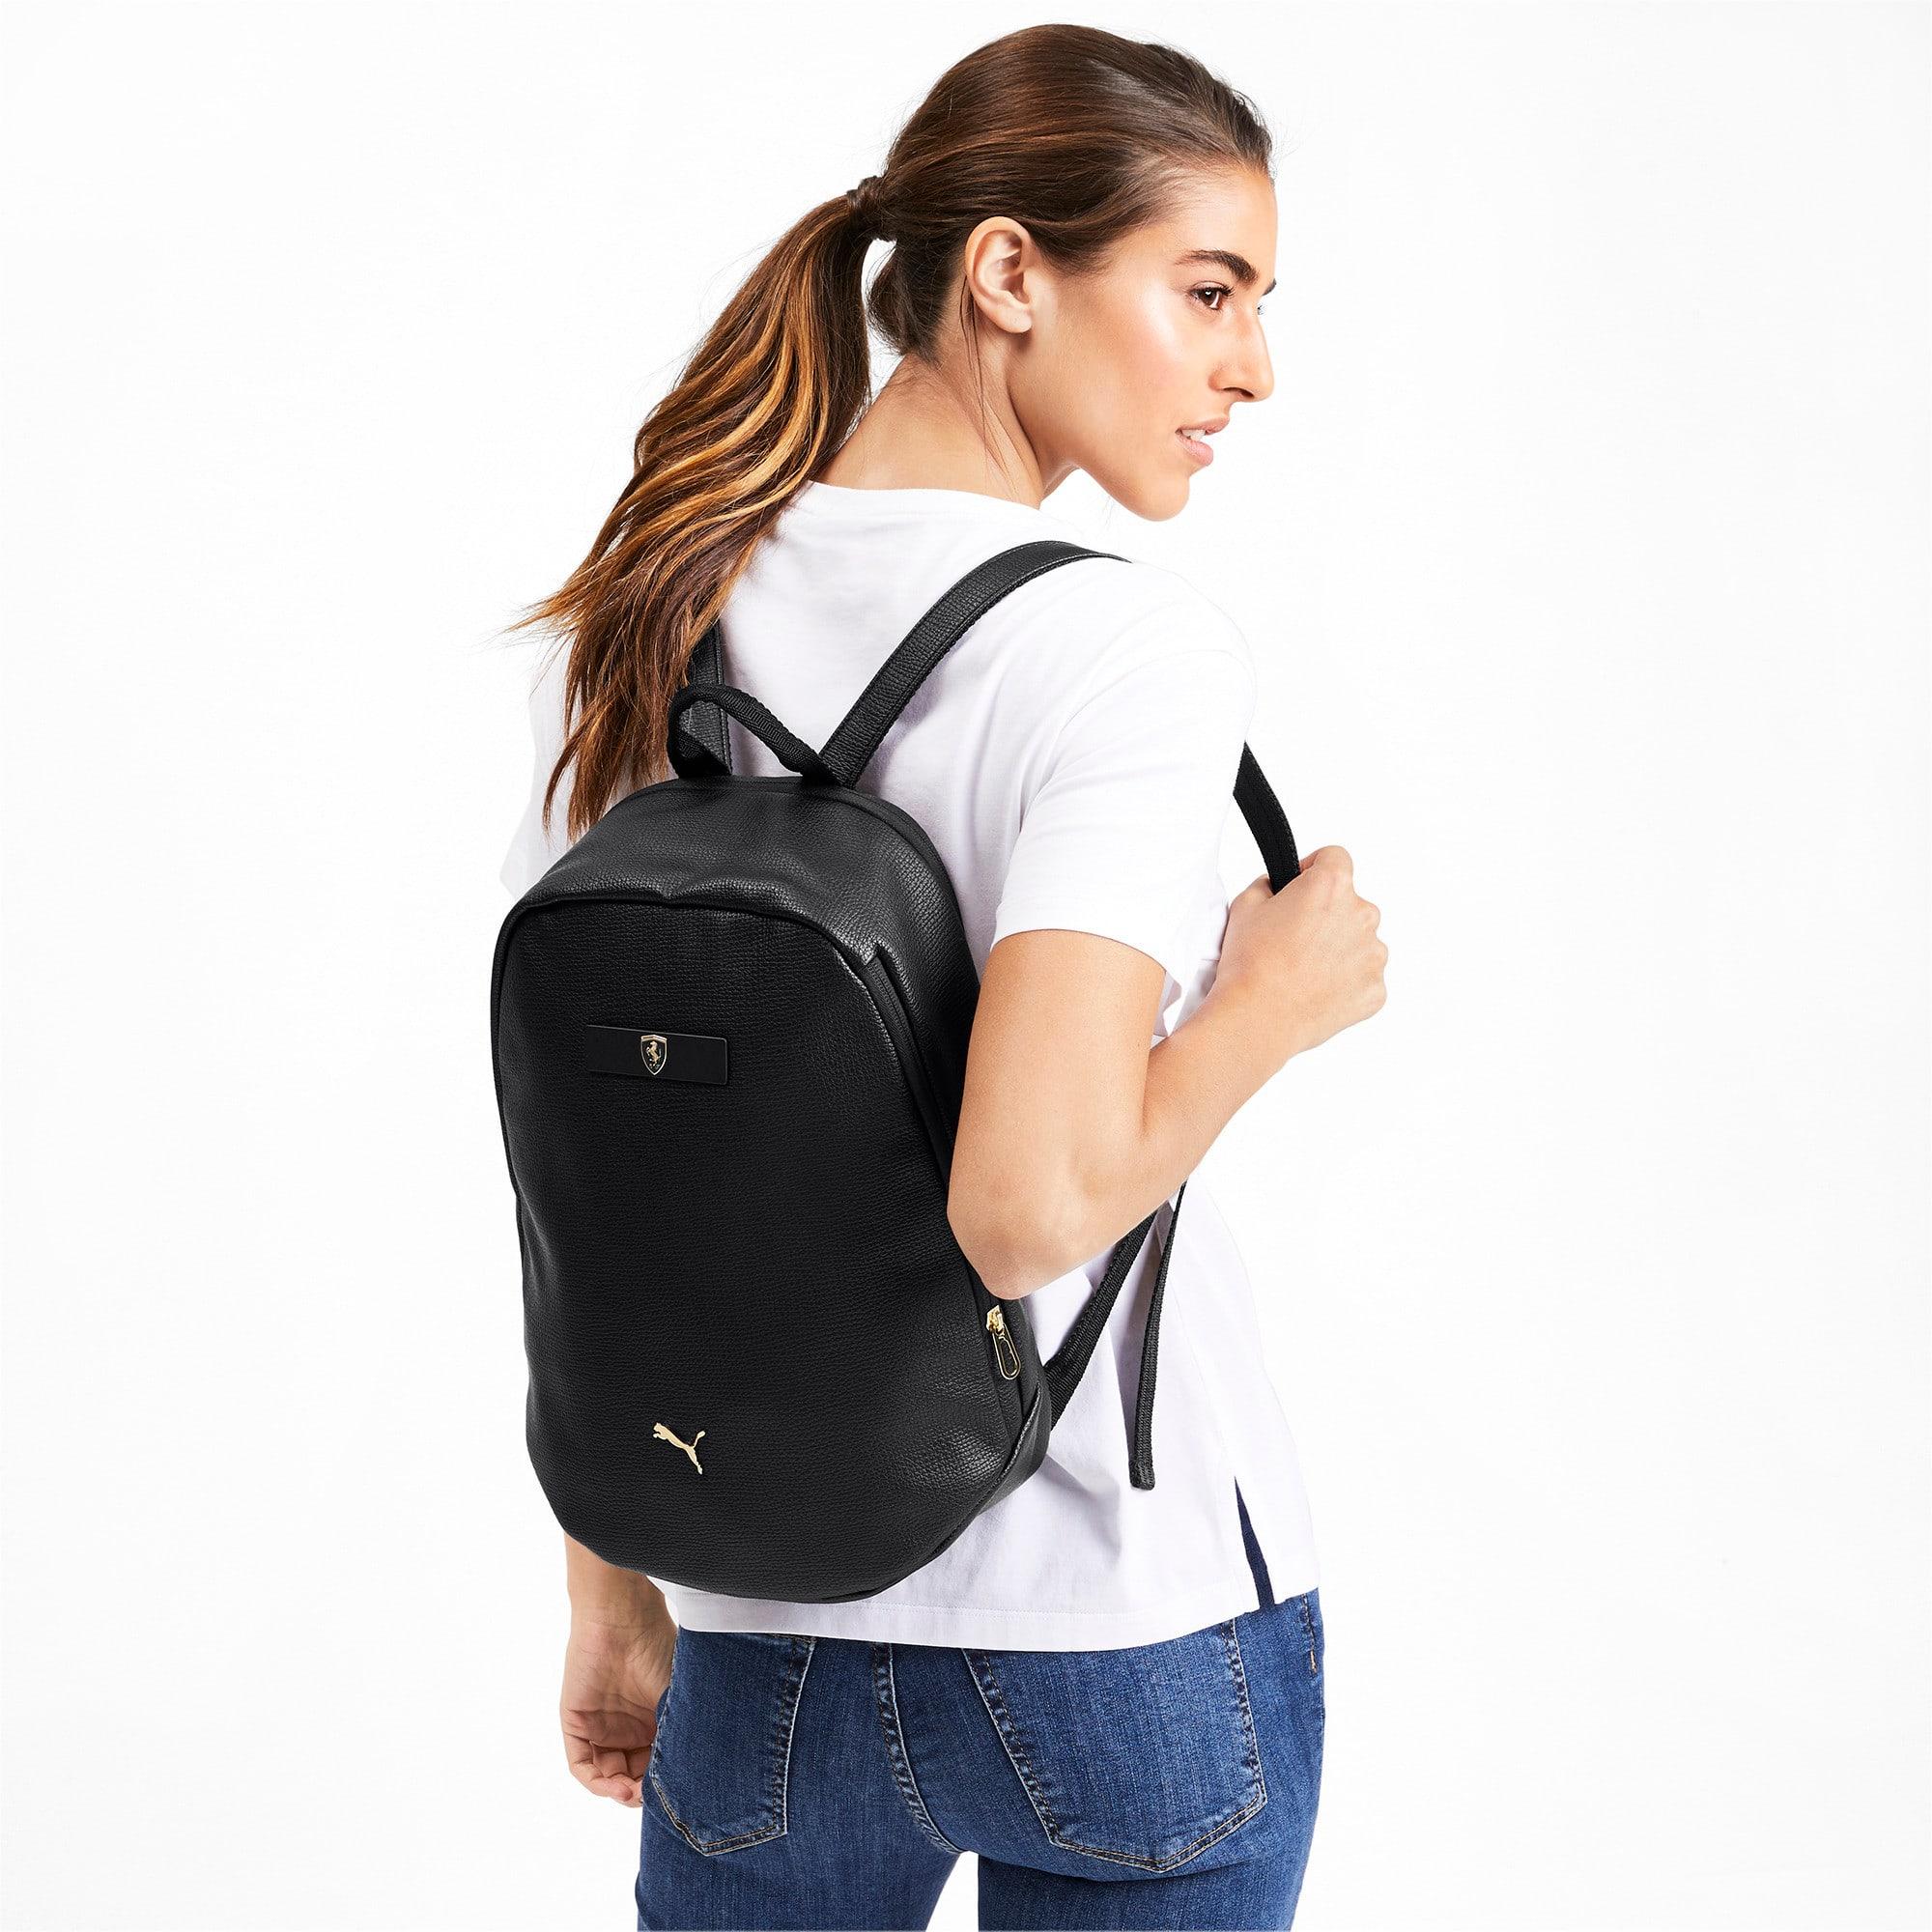 Thumbnail 2 of Ferrari Lifestyle Zainetto Backpack, Puma Black, medium